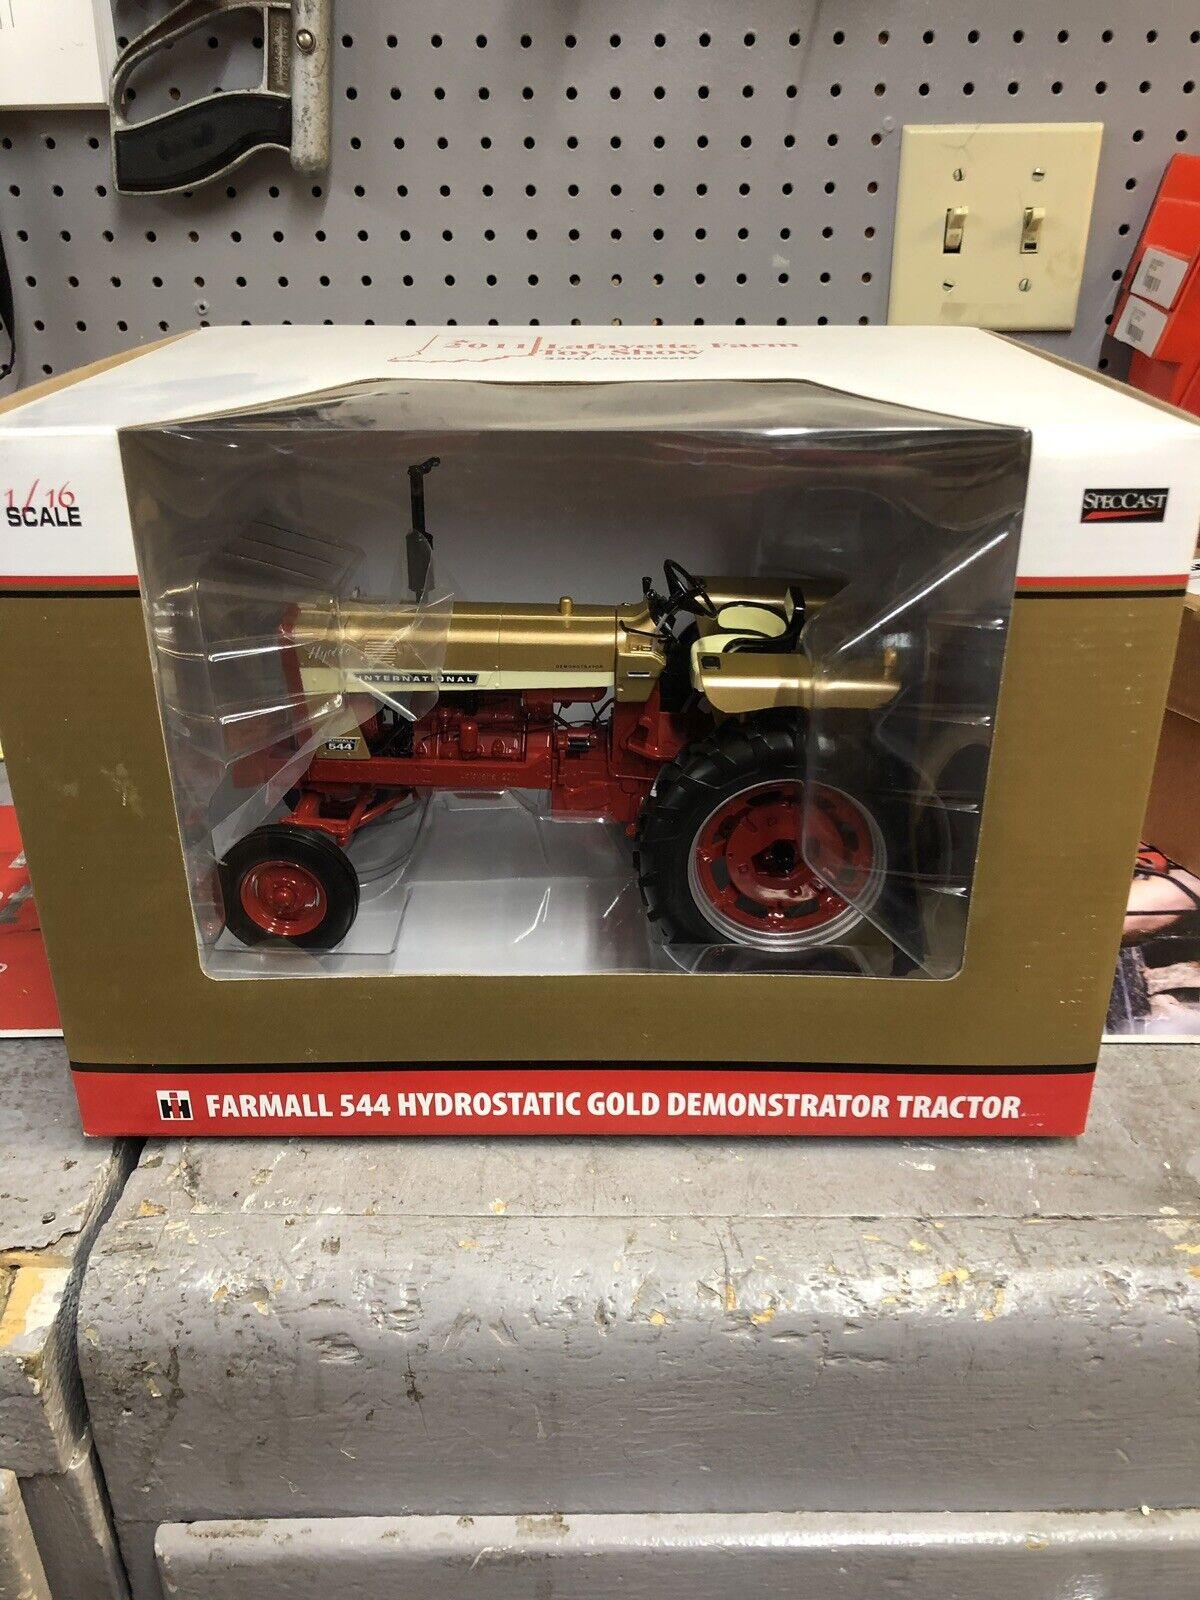 CaseIH. 544 Hydrostatic gold Demonstrator Toy Tractor. Farmall.